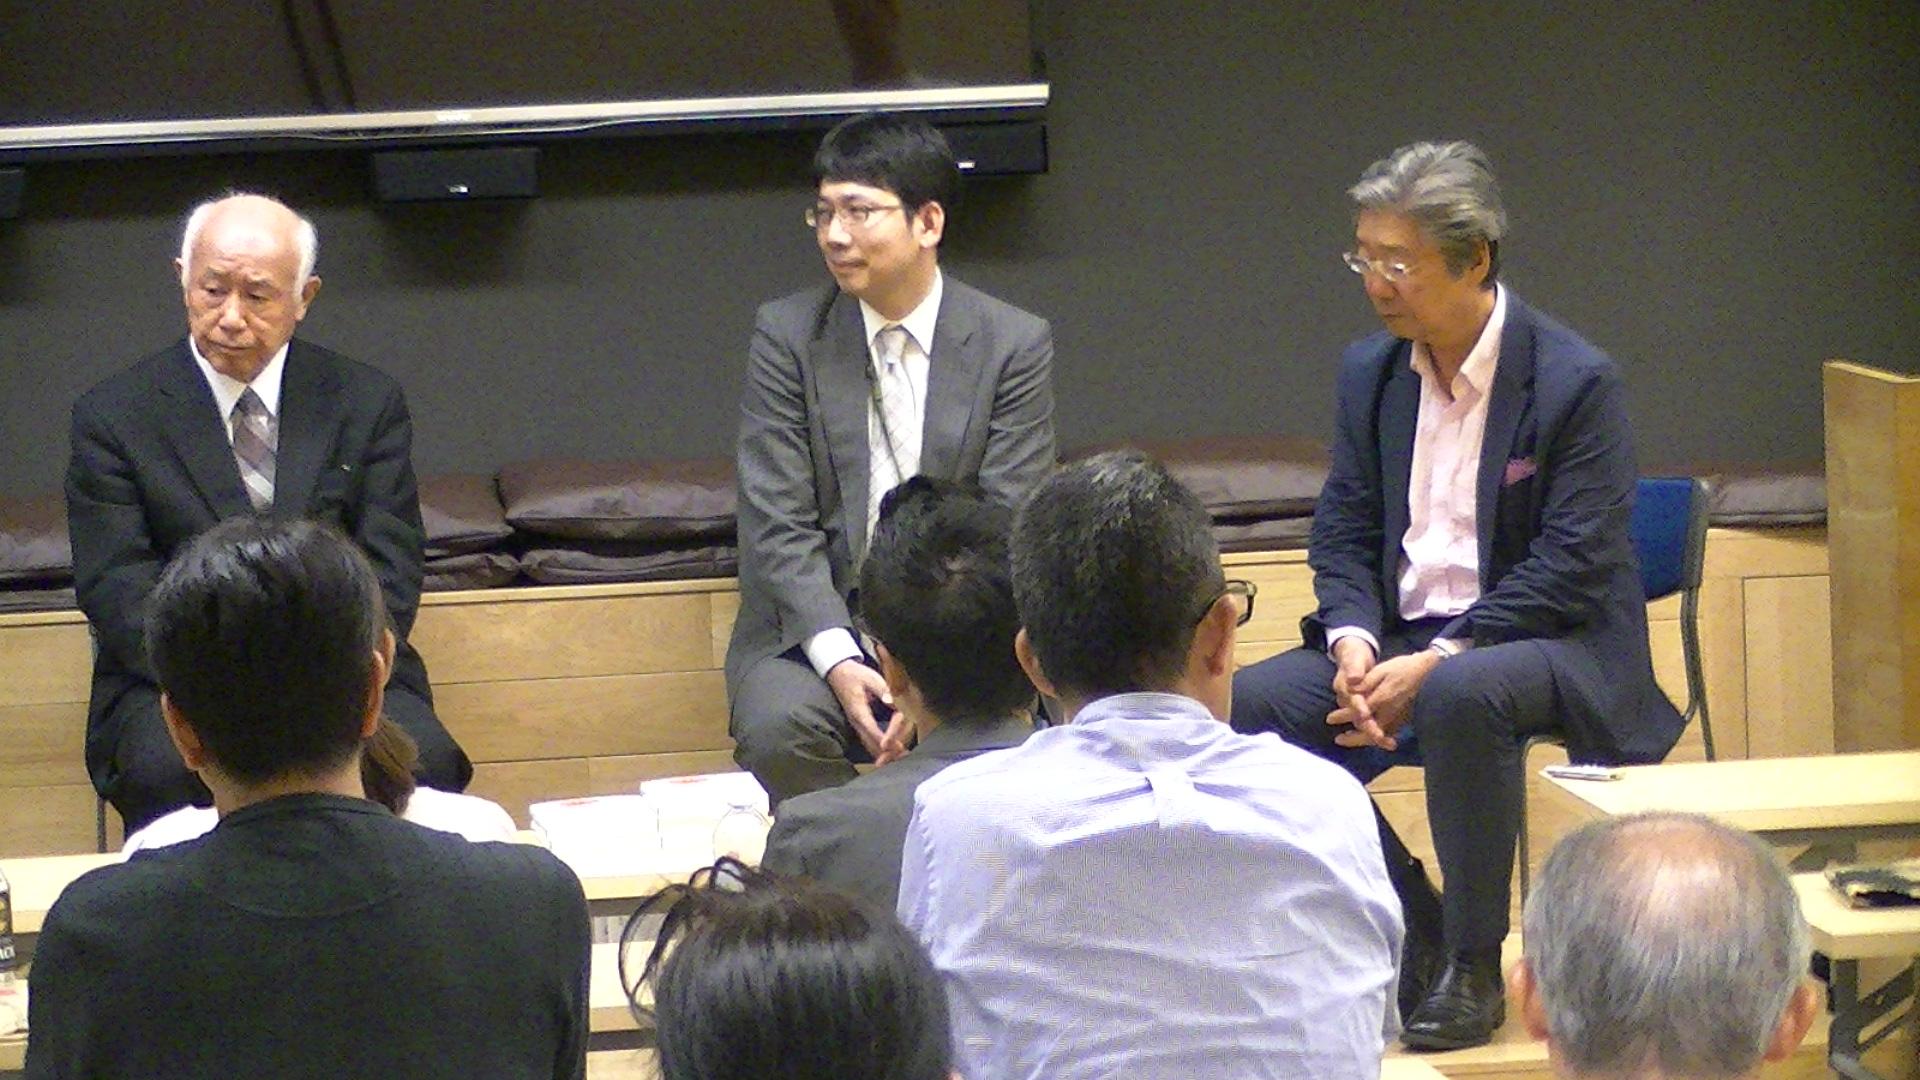 PIC 0044 - 4月1日東京思風塾の開催になります。